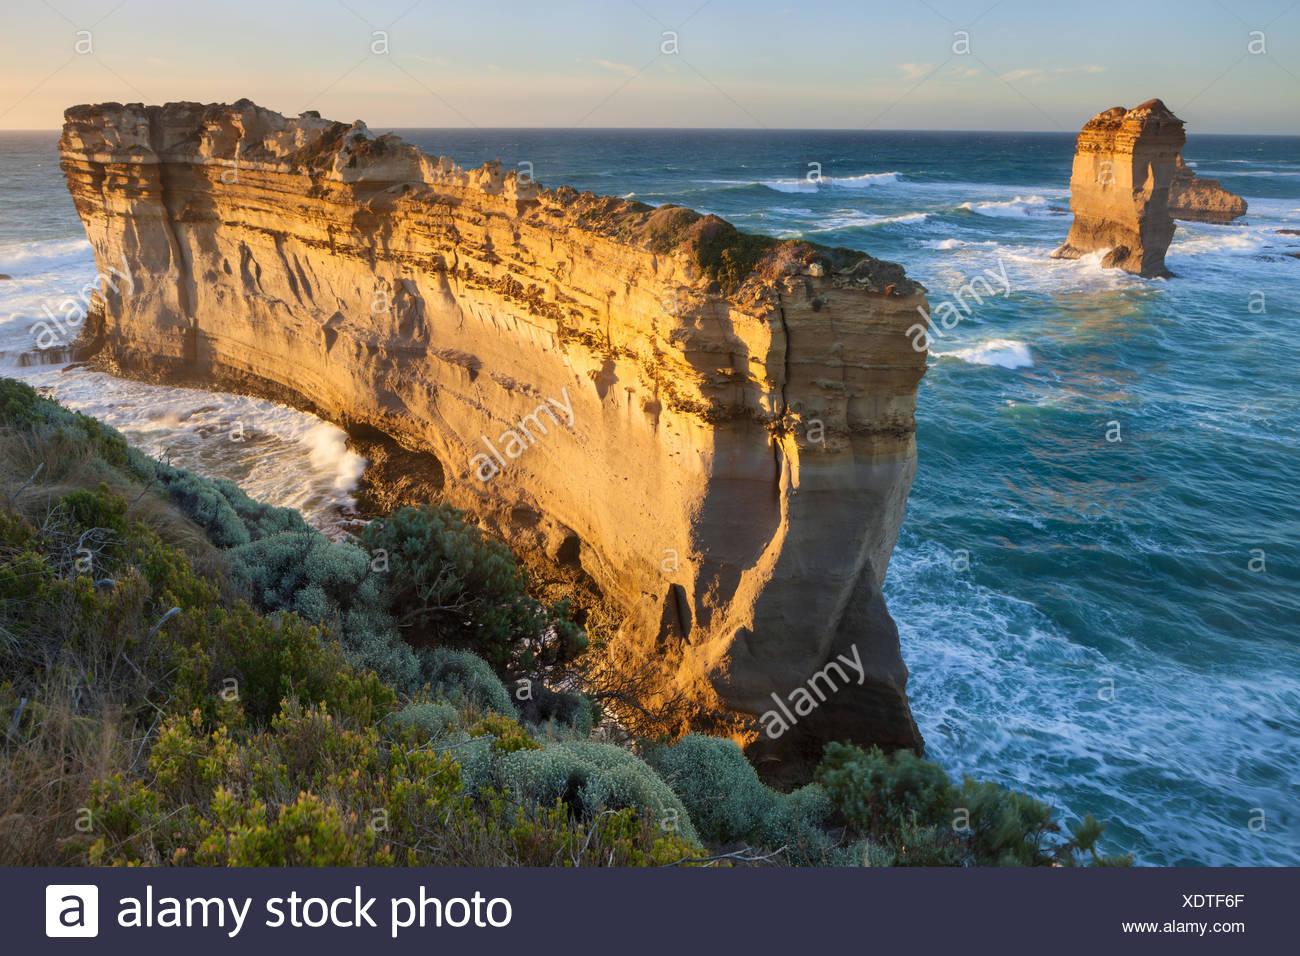 Razorback, l'Australie, Victoria, port Campbell, parc national, mer, côte, rock, falaise, Photo Stock